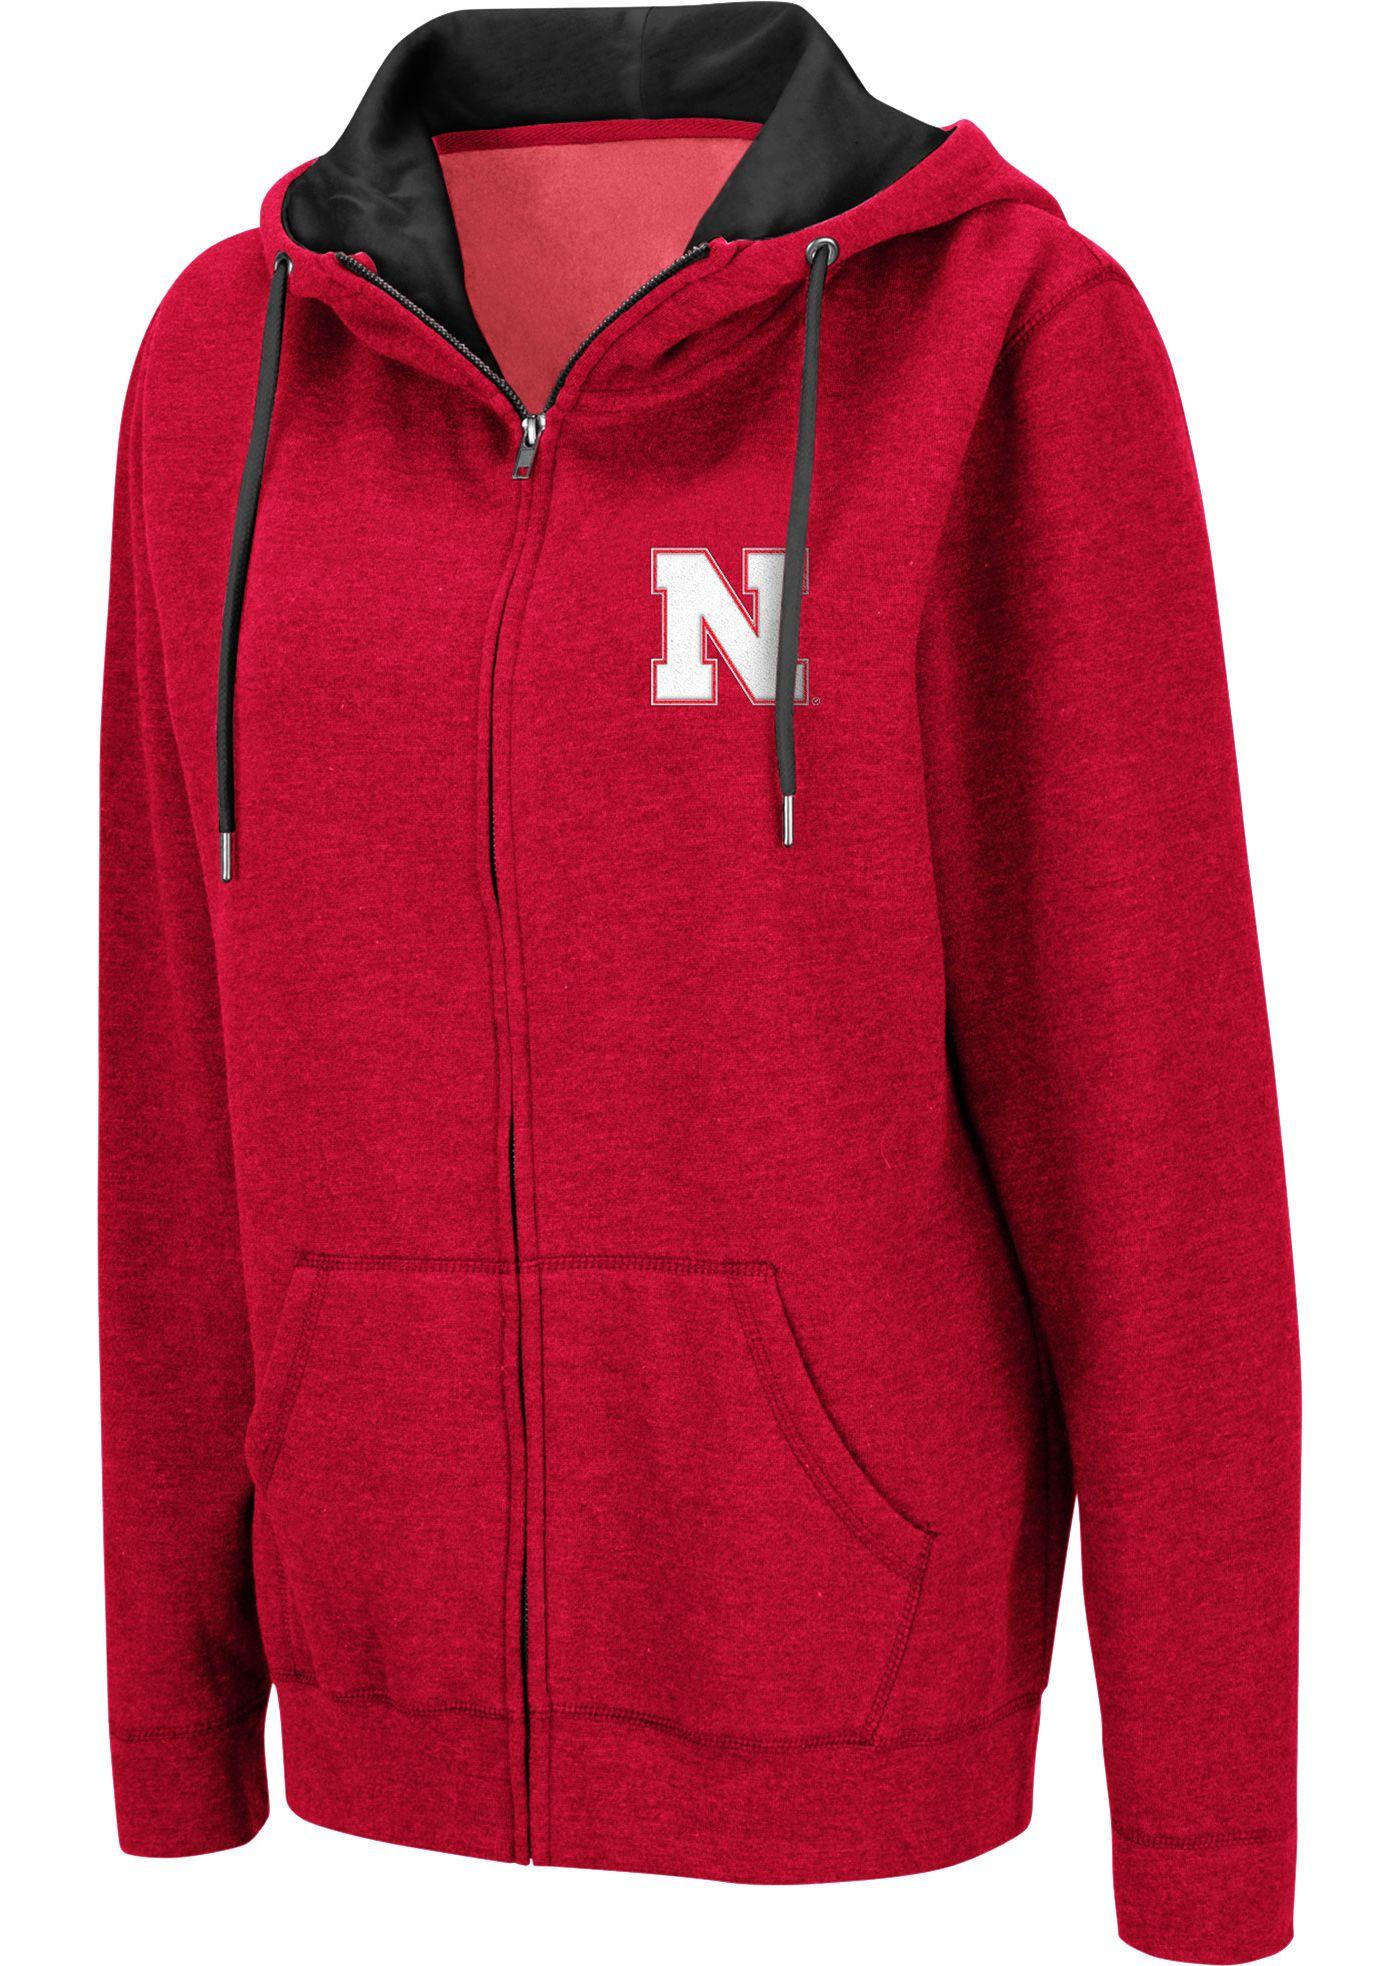 Colosseum Women's Nebraska Cornhuskers Scarlet Full-Zip Hoodie